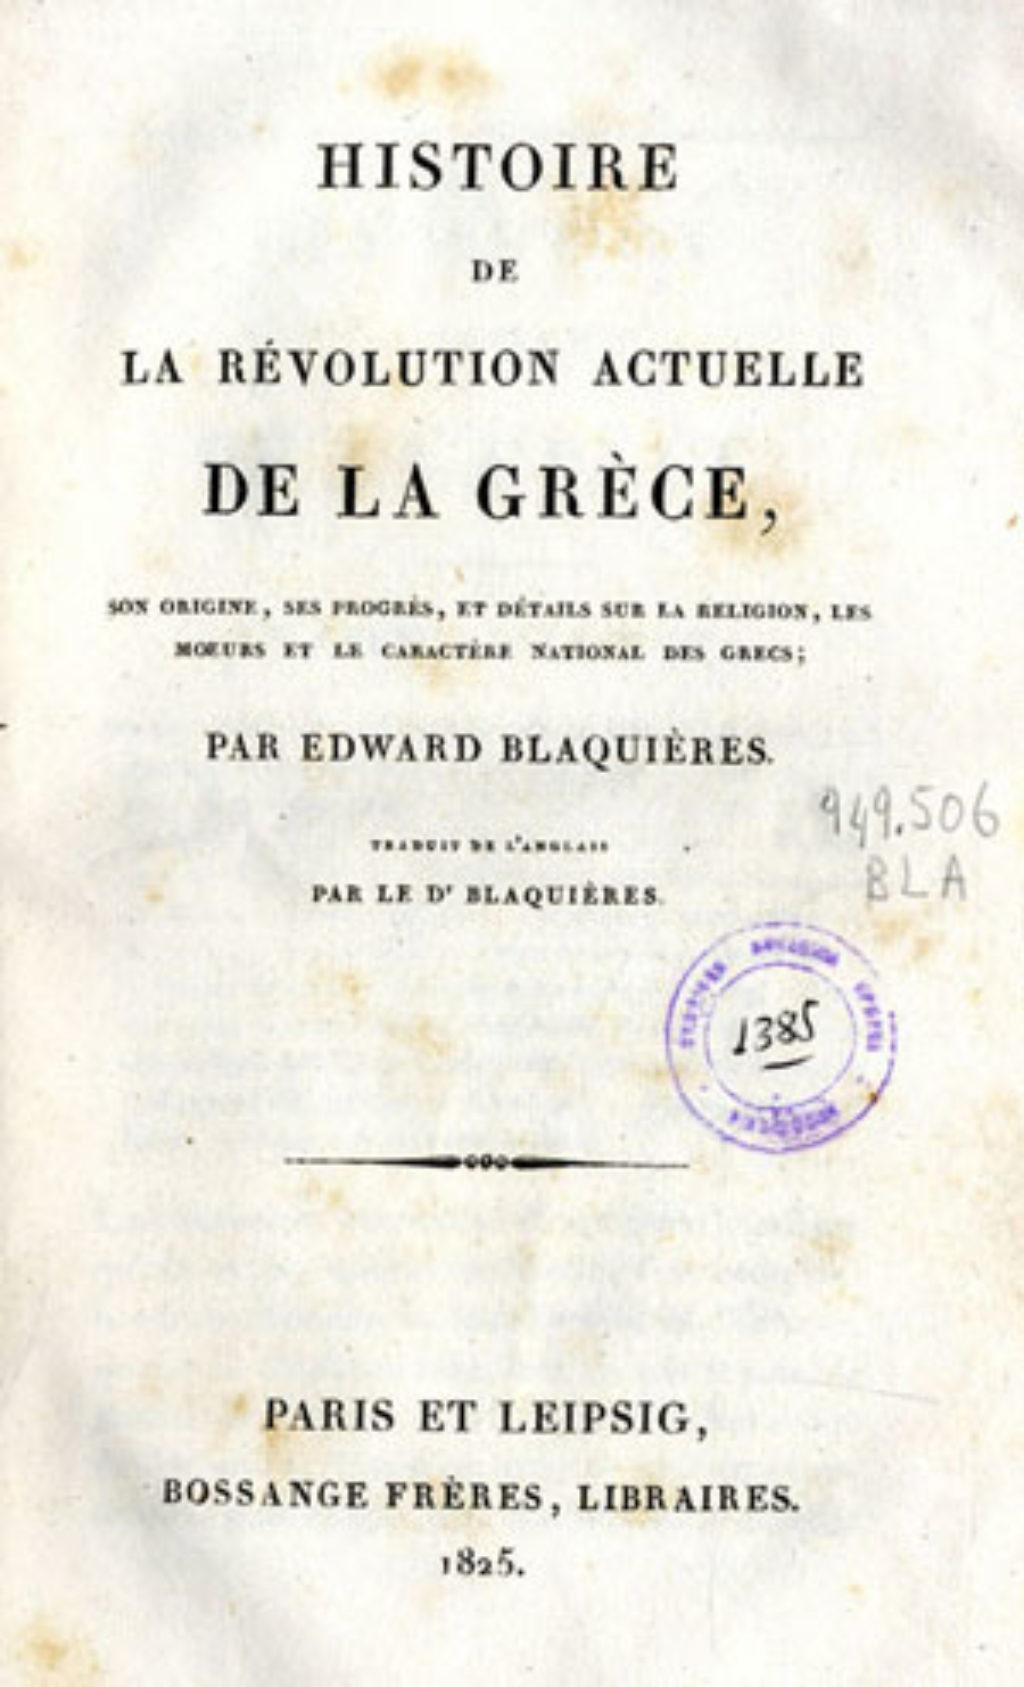 Edward Blaquiere, Ιστορία της εν εξελίξει ελληνικής επανάστασης, 1825